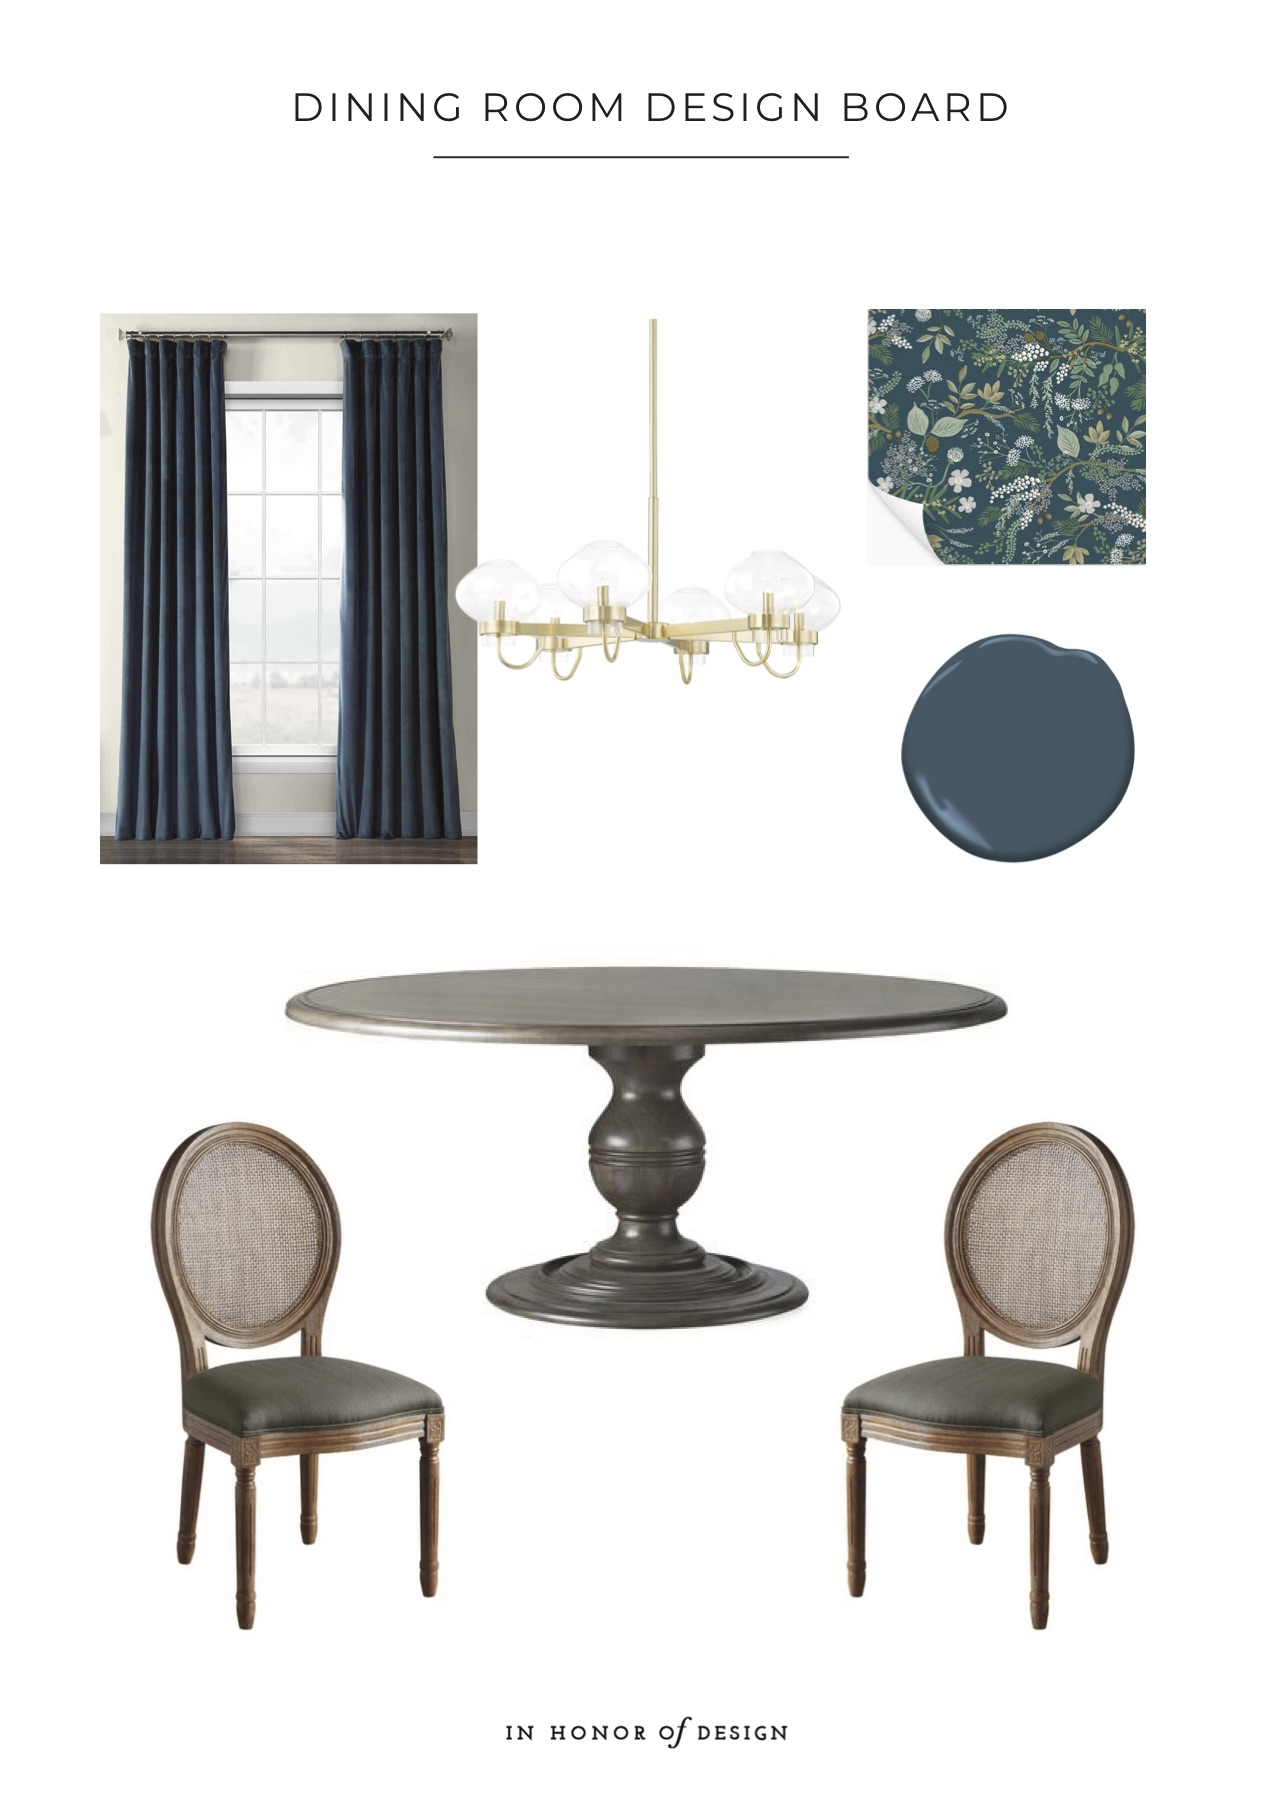 dining room design board - IHOD